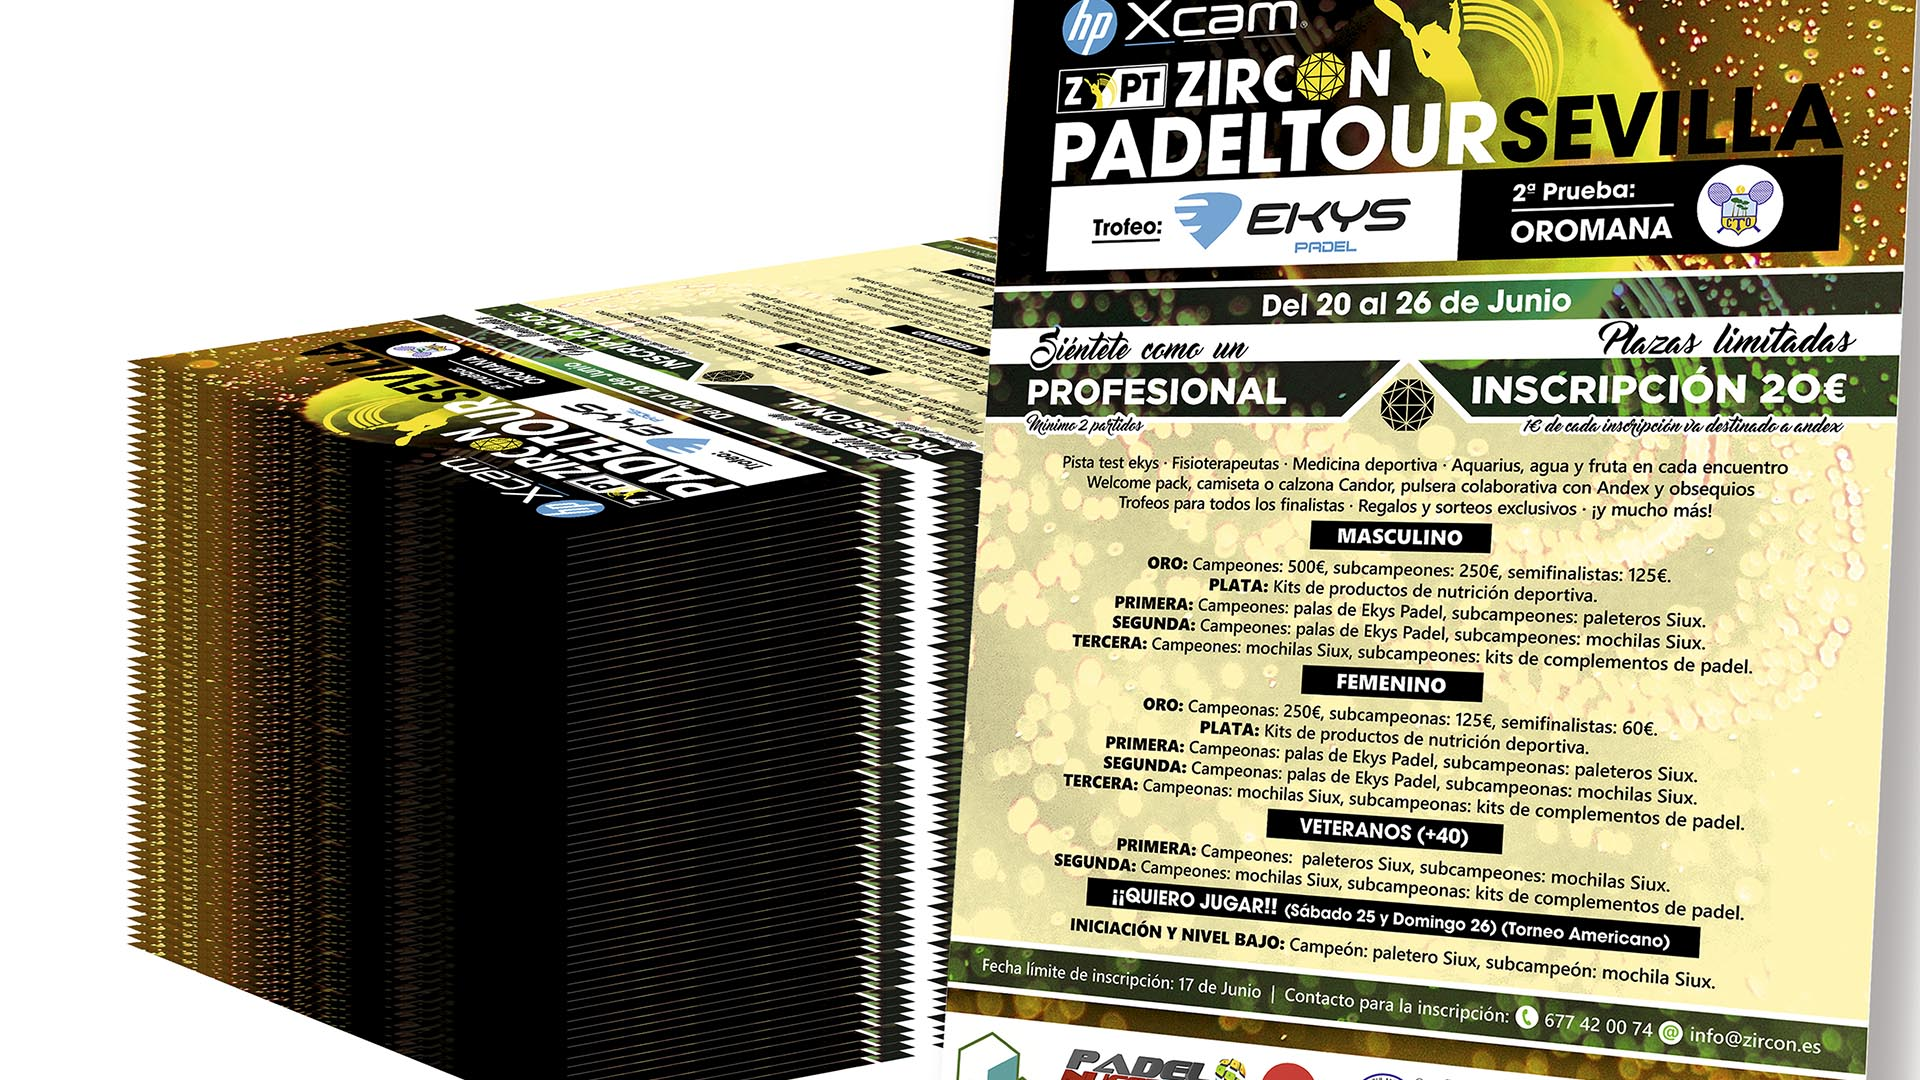 ZIRCON EVENTOS - Cartel Zircon Padel Tour 2